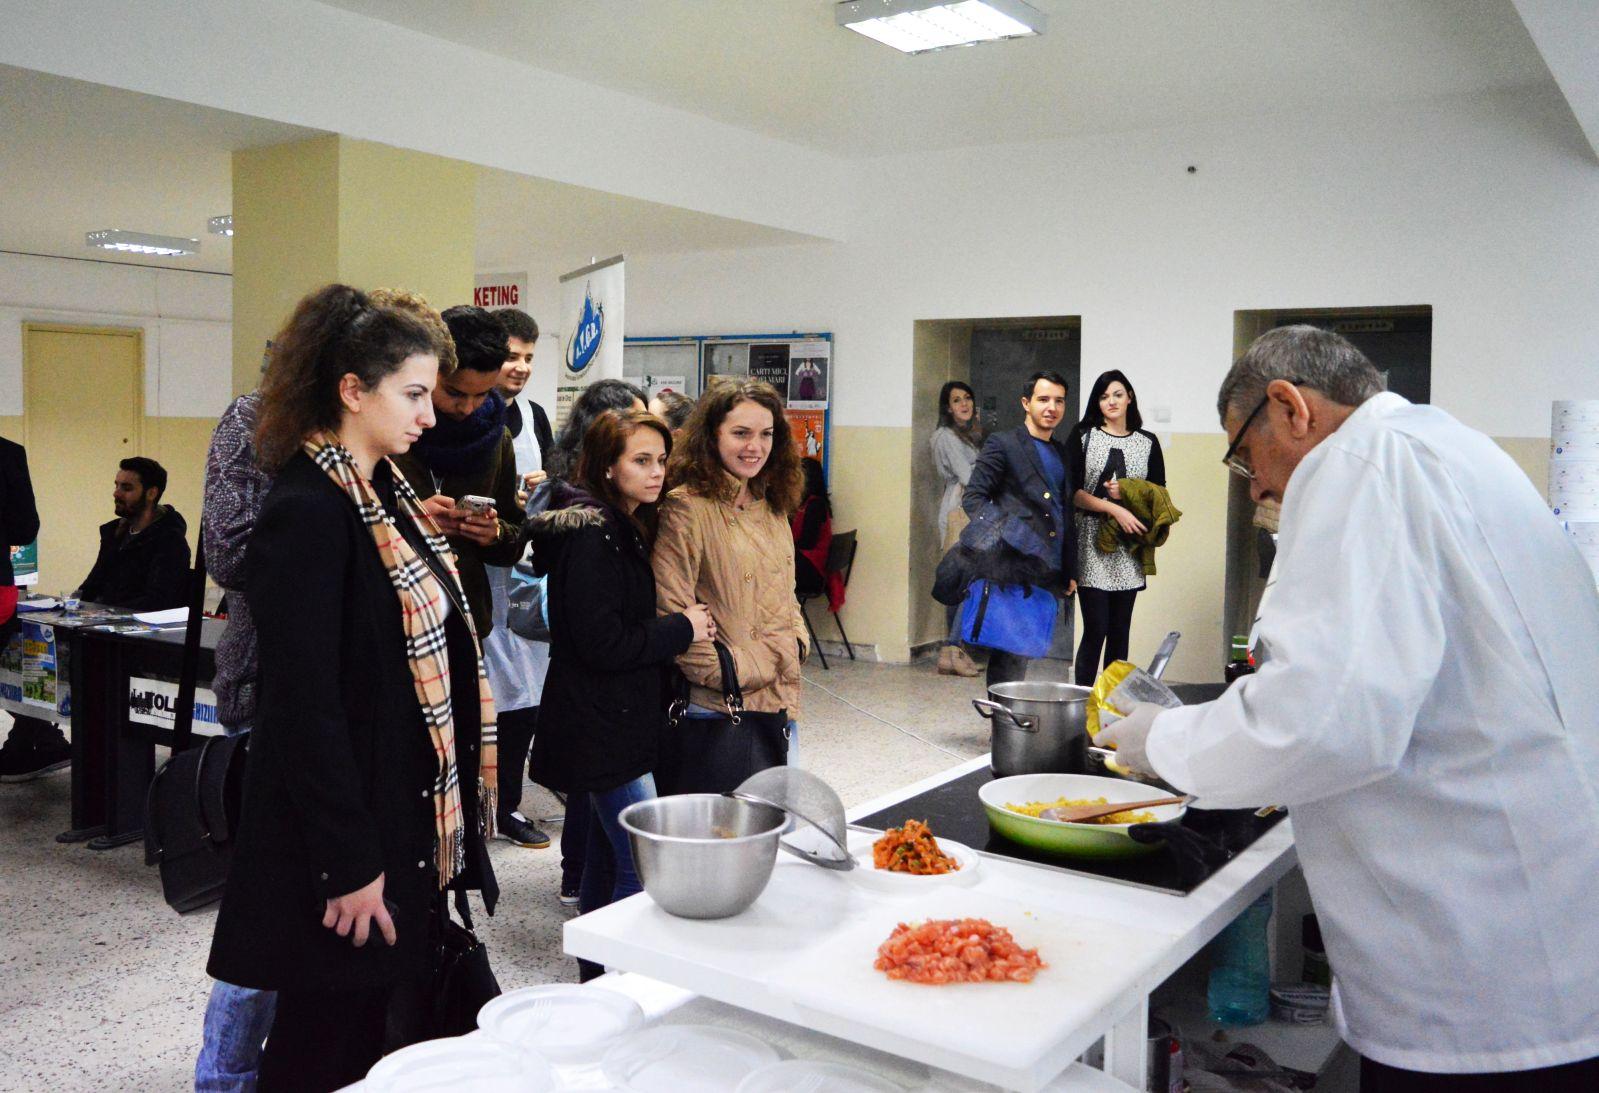 Sarbatoarea_Gustului_ASE_Chef_Patrick_Pierre_Show_Culinar_Sanatos_Gustos_15